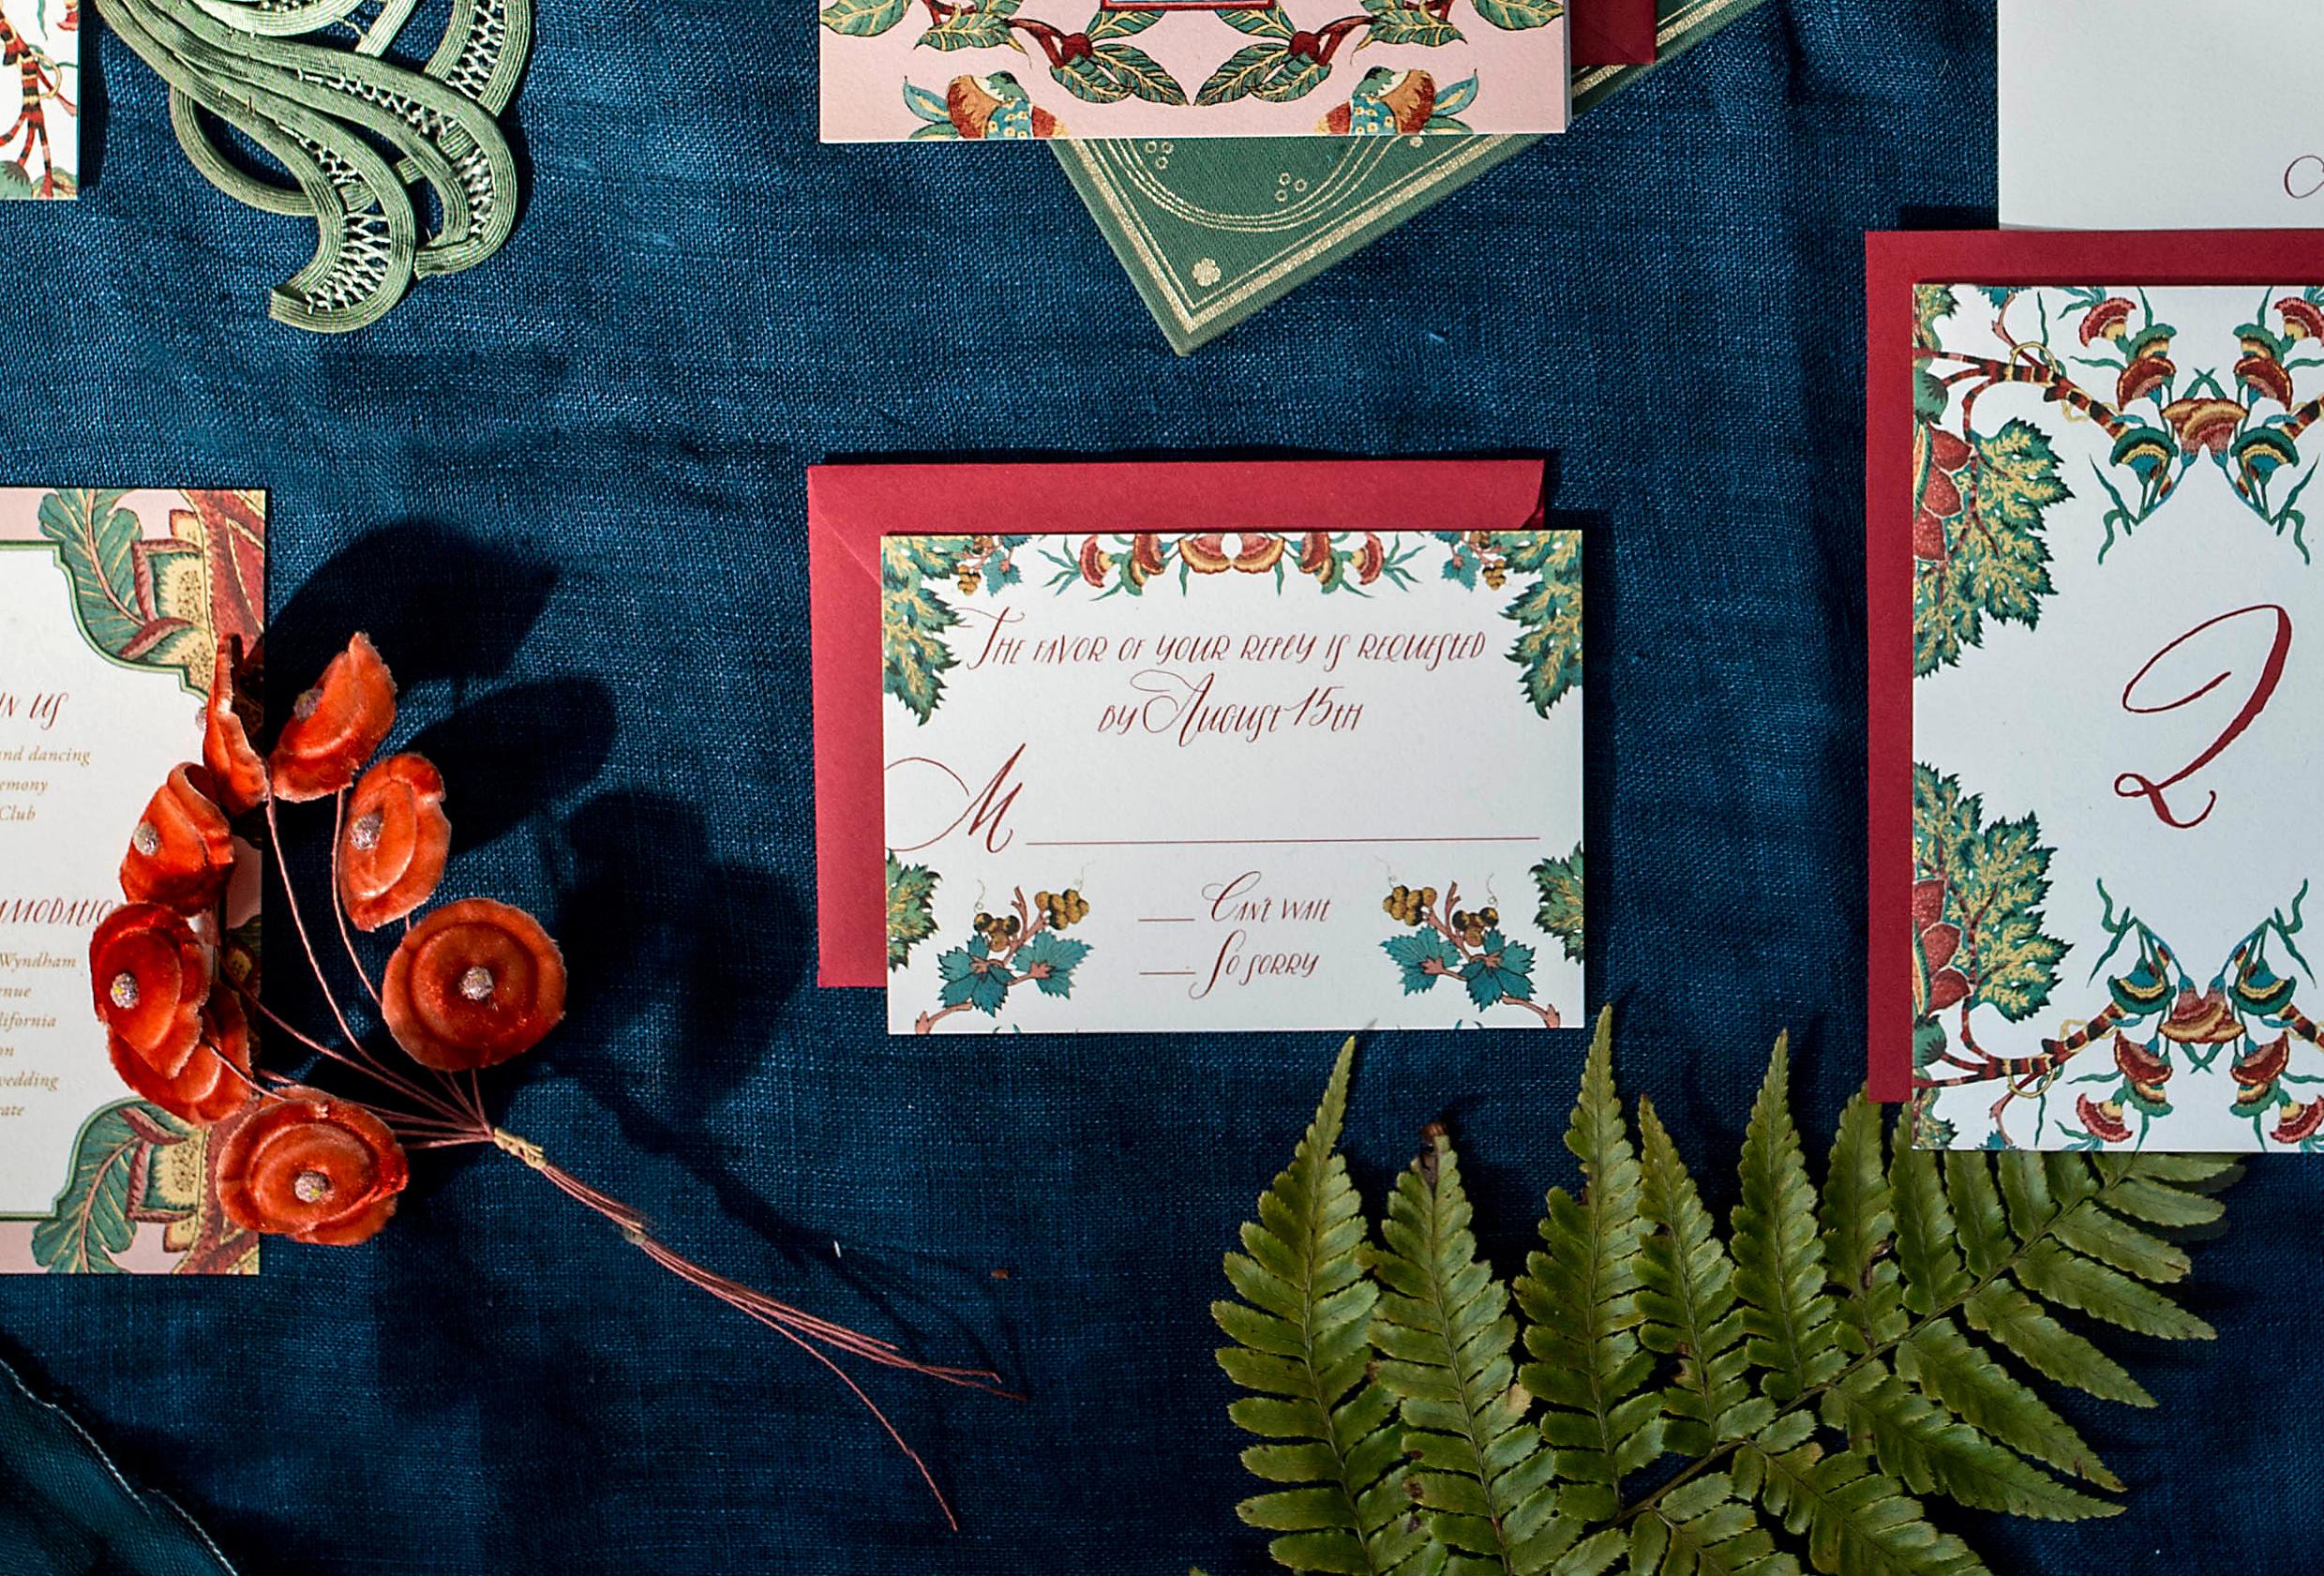 mamaycrop2-bright-unique-vintage-wedding-invitations-hellotenfold-329.jpg